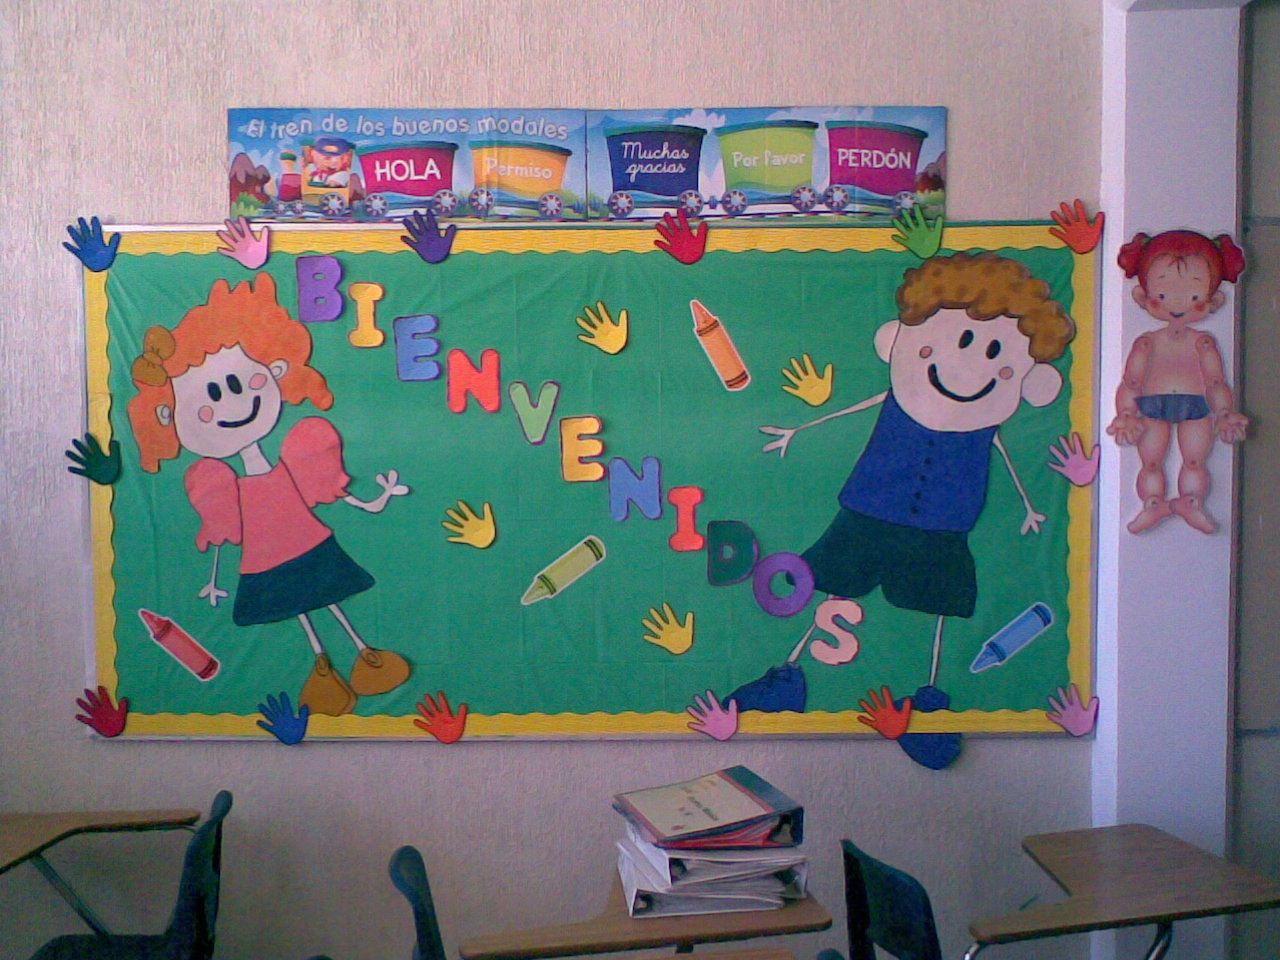 Bonita bienvenida escuela ideas pinterest - Murales para salon ...